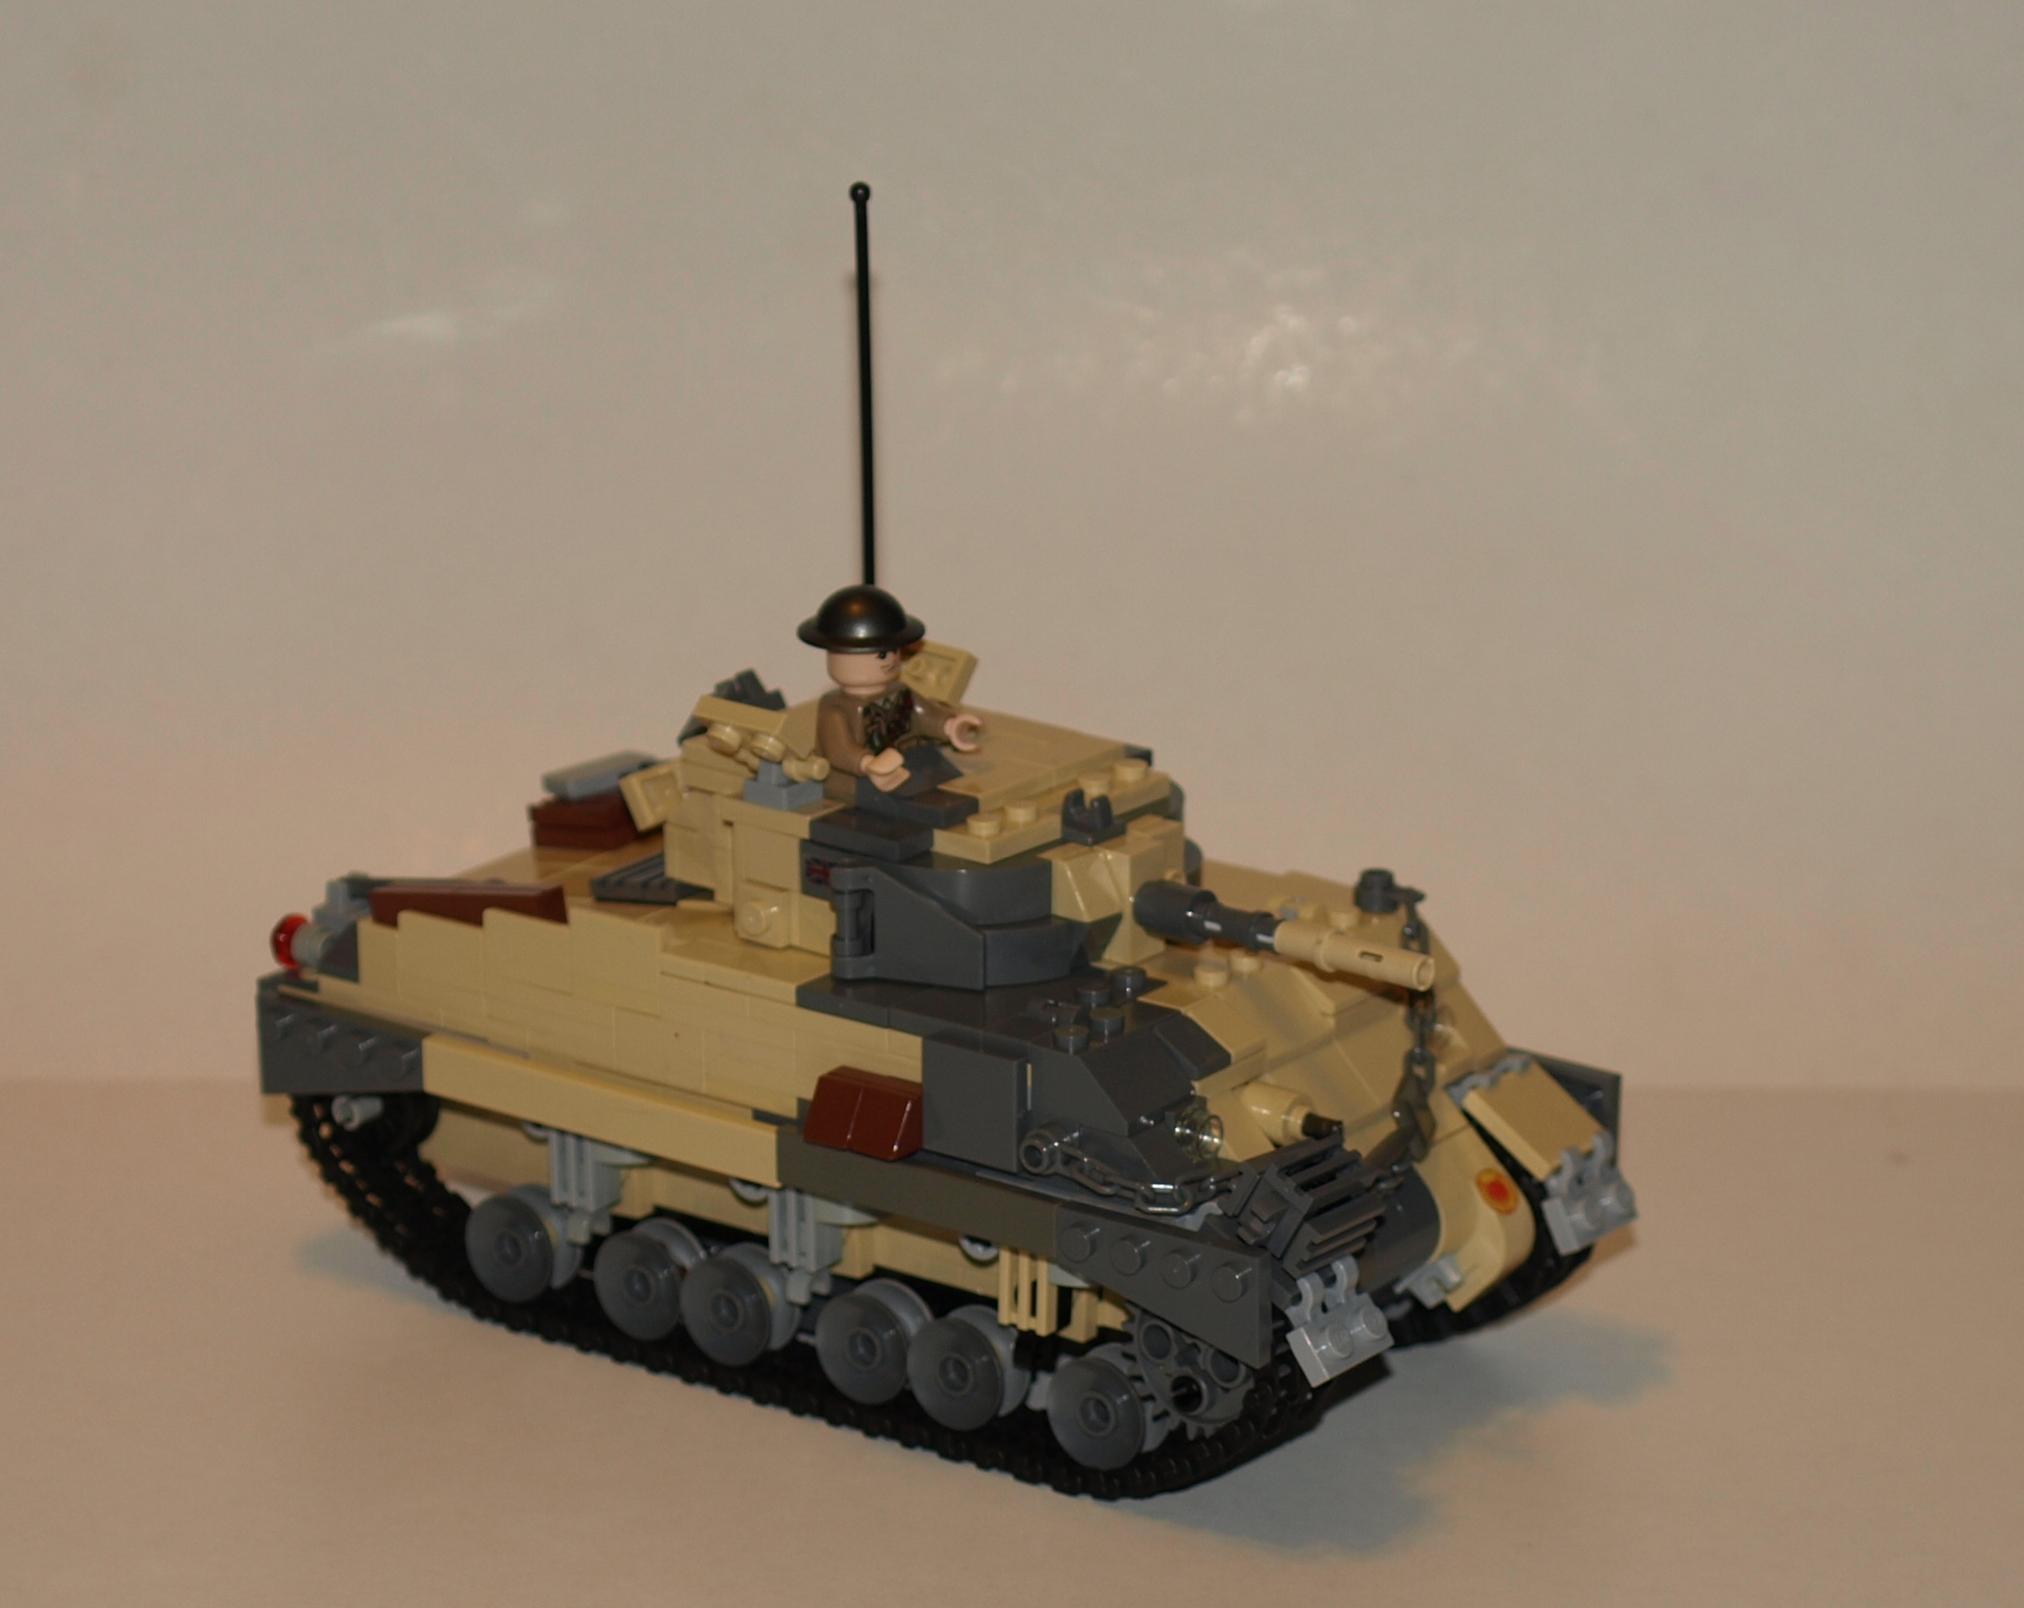 wallpaper weapon lego armor desert africa british army